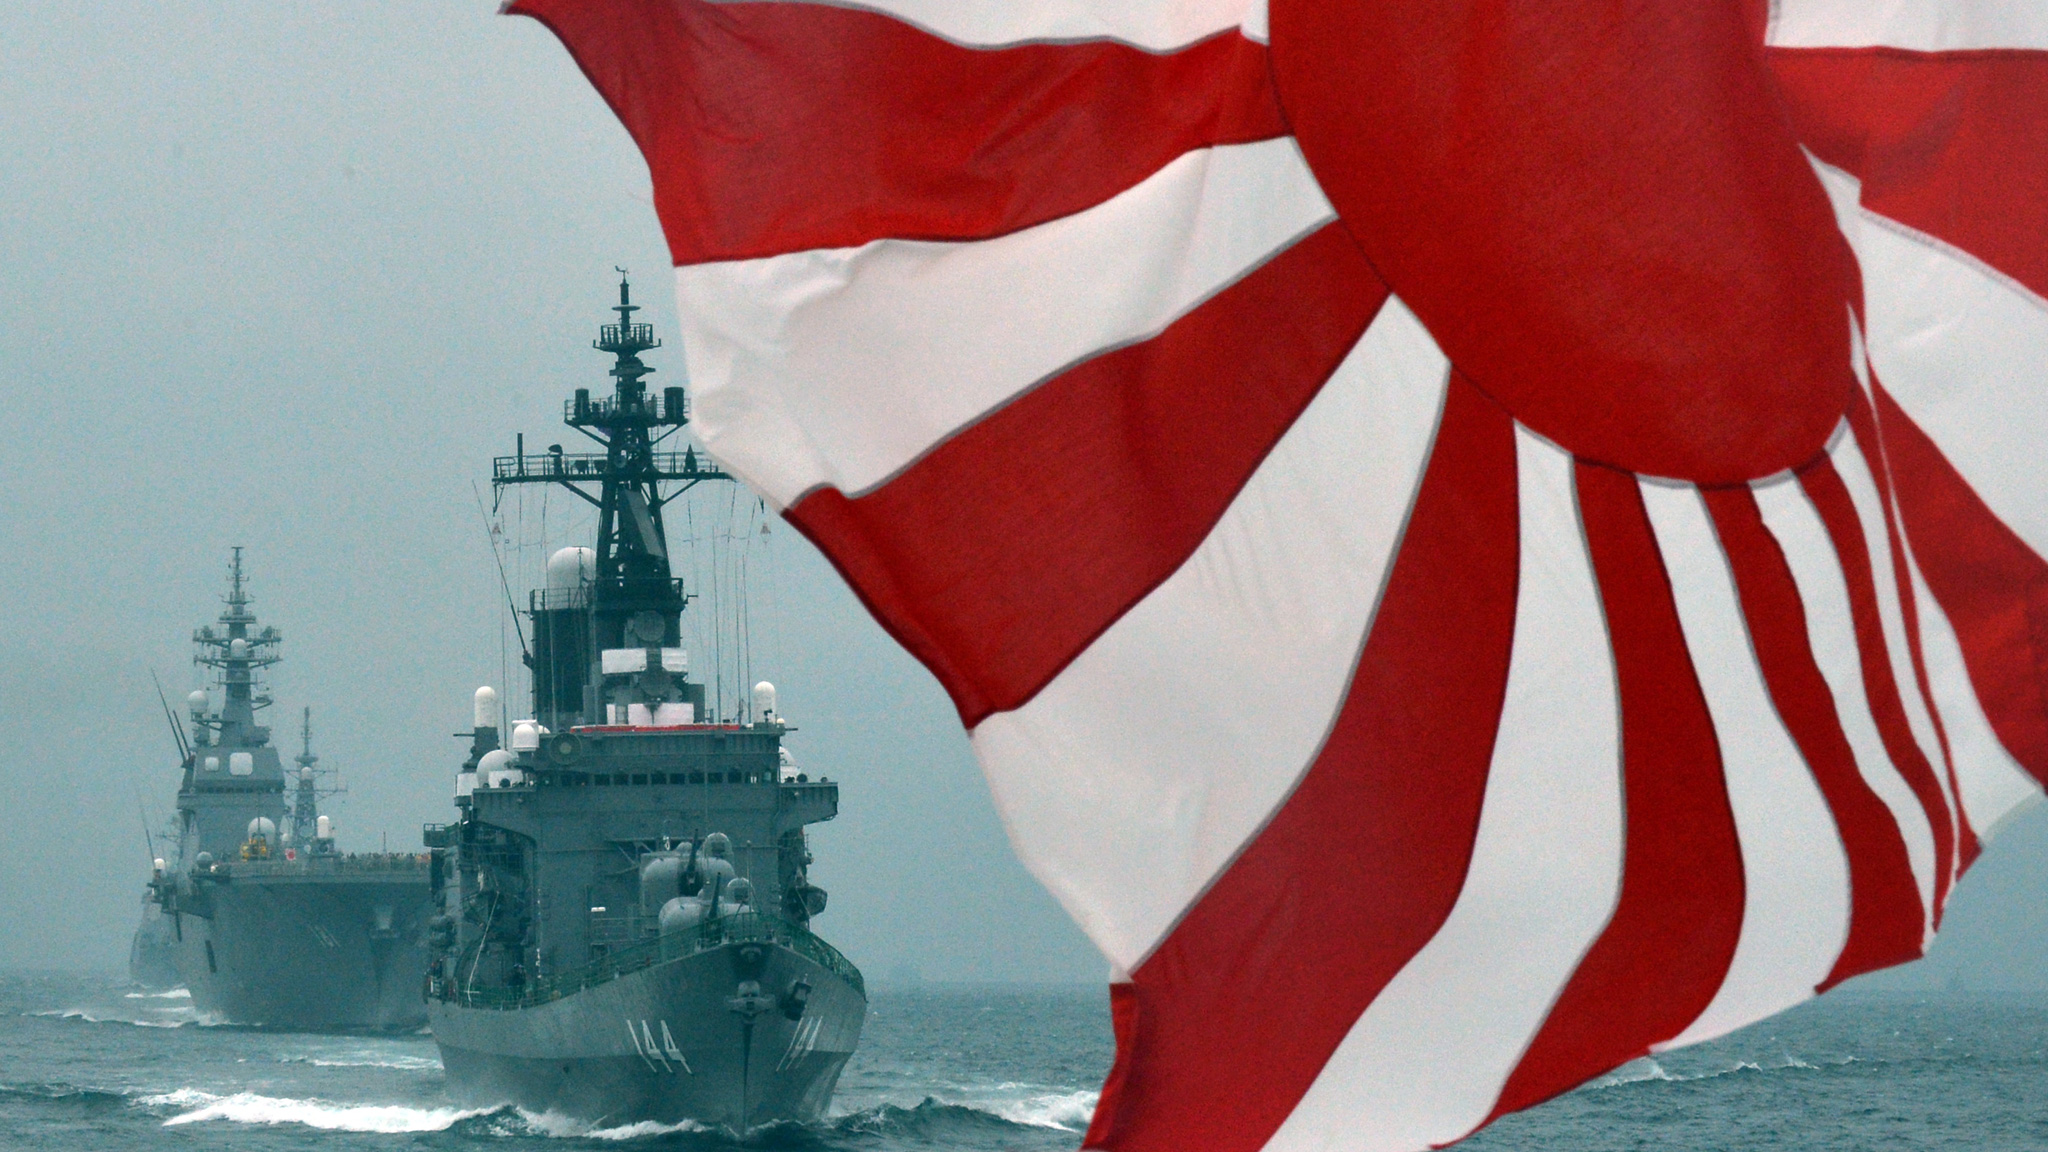 philippines backs rearming of japan